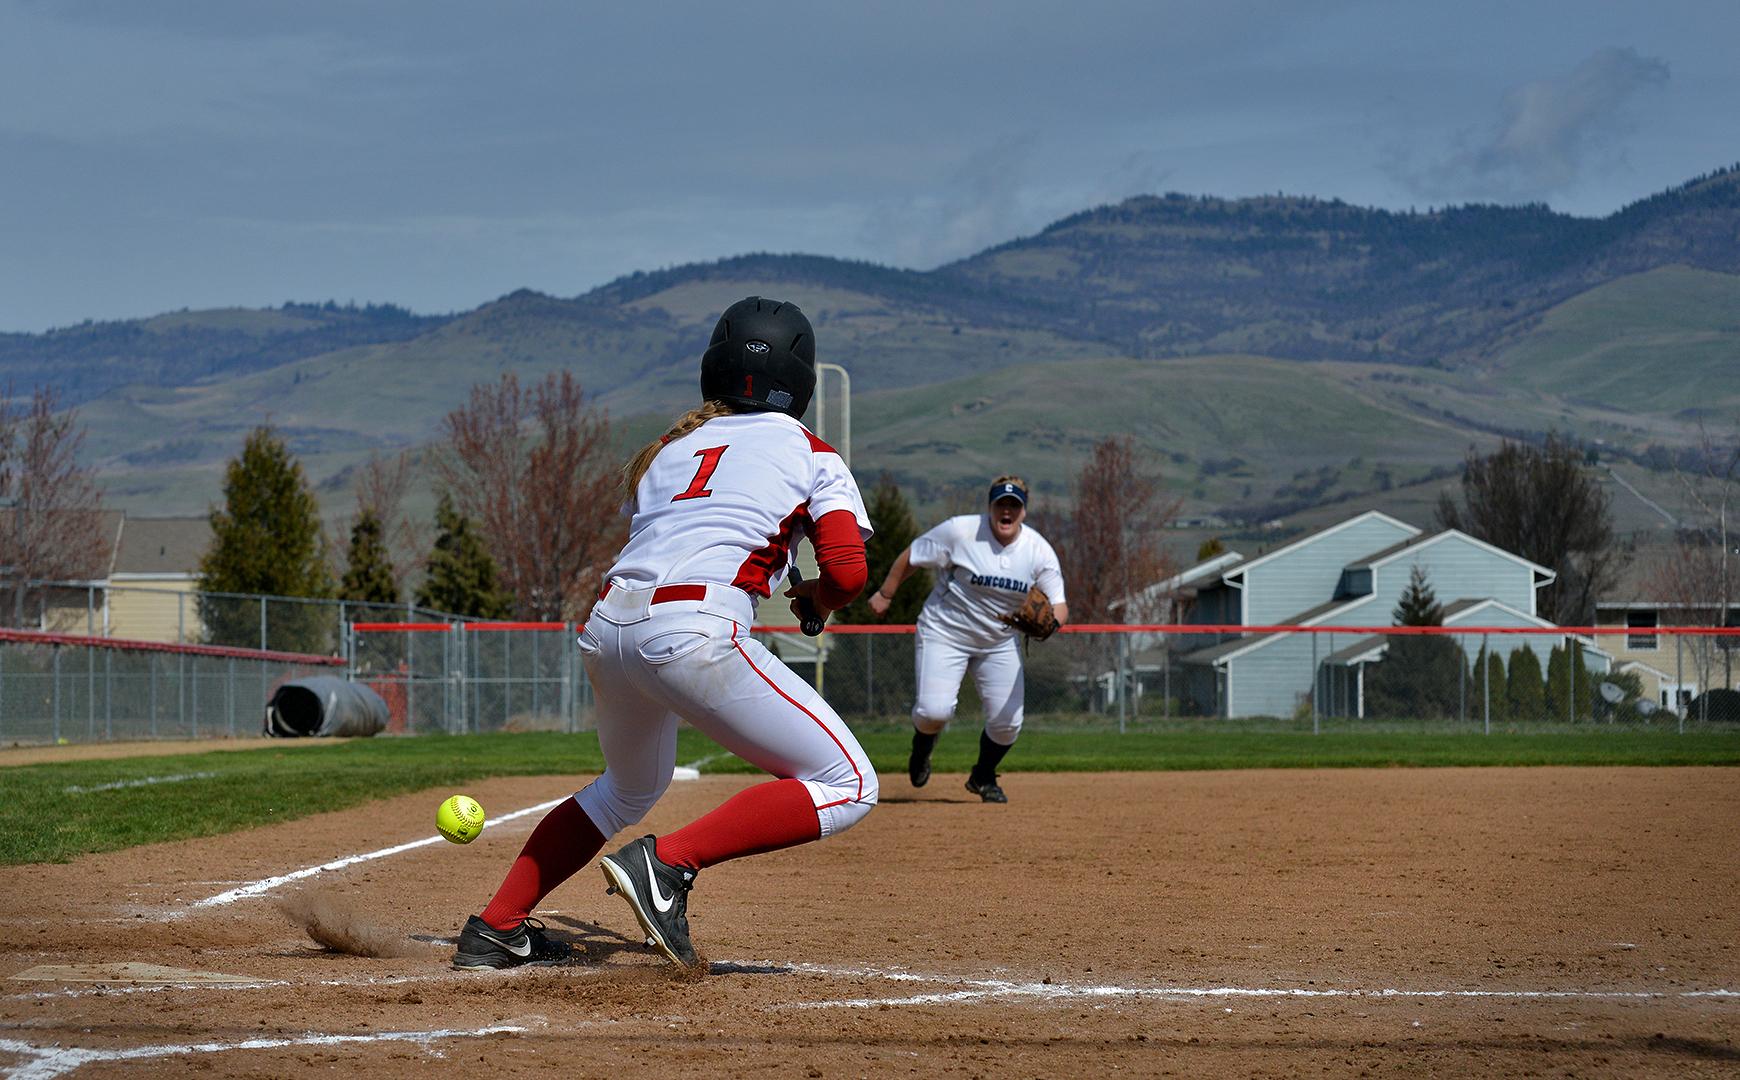 Kara Kelsey SOU softball nikon d600 70-300mm sports photography